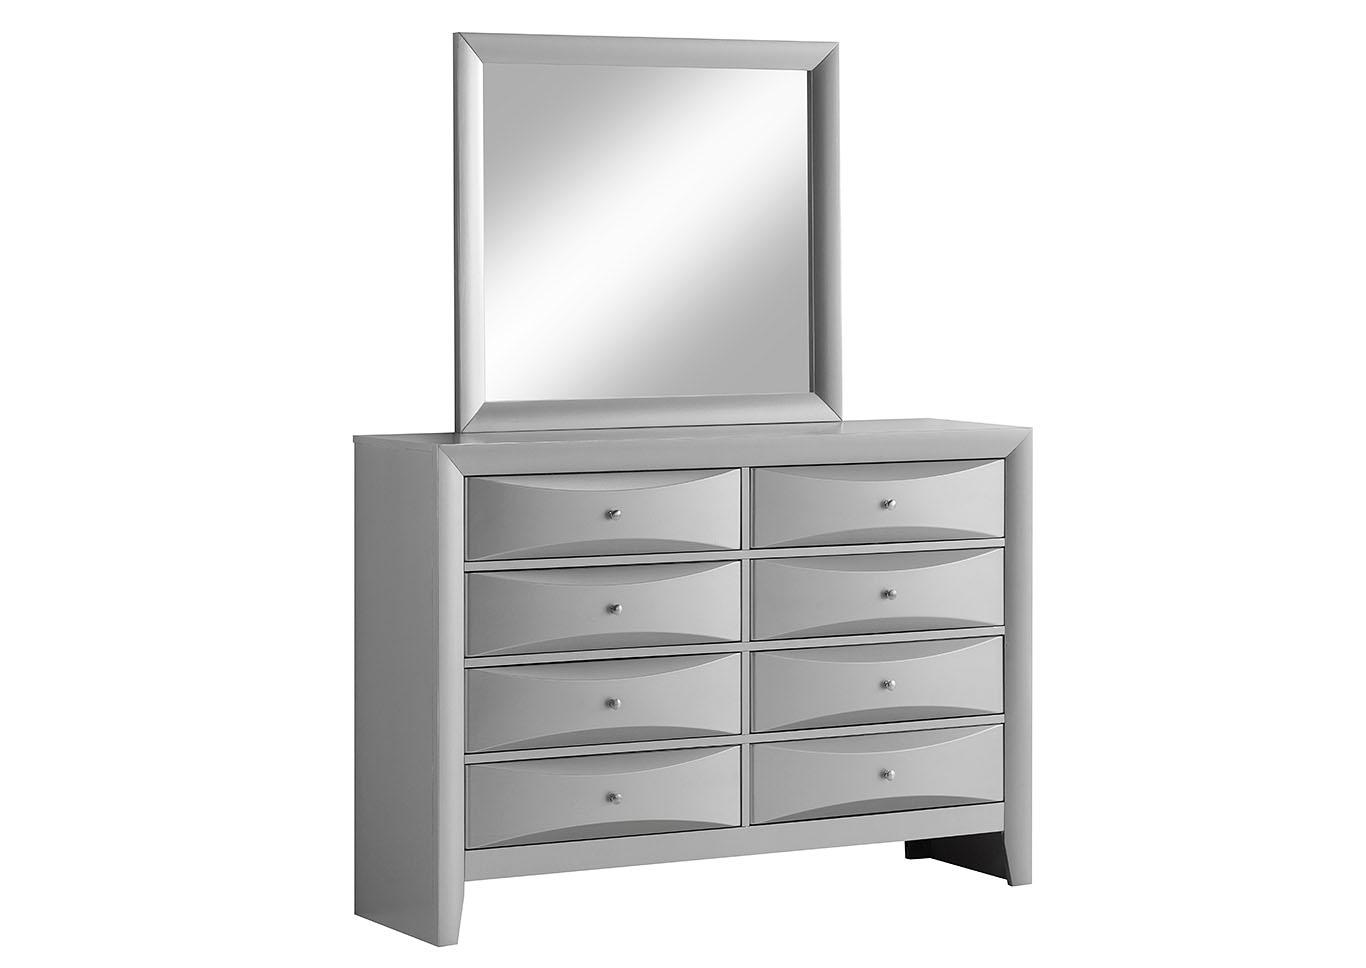 Royal Furniture - Brooklyn, NY Gray Framed Rectangular Mirror